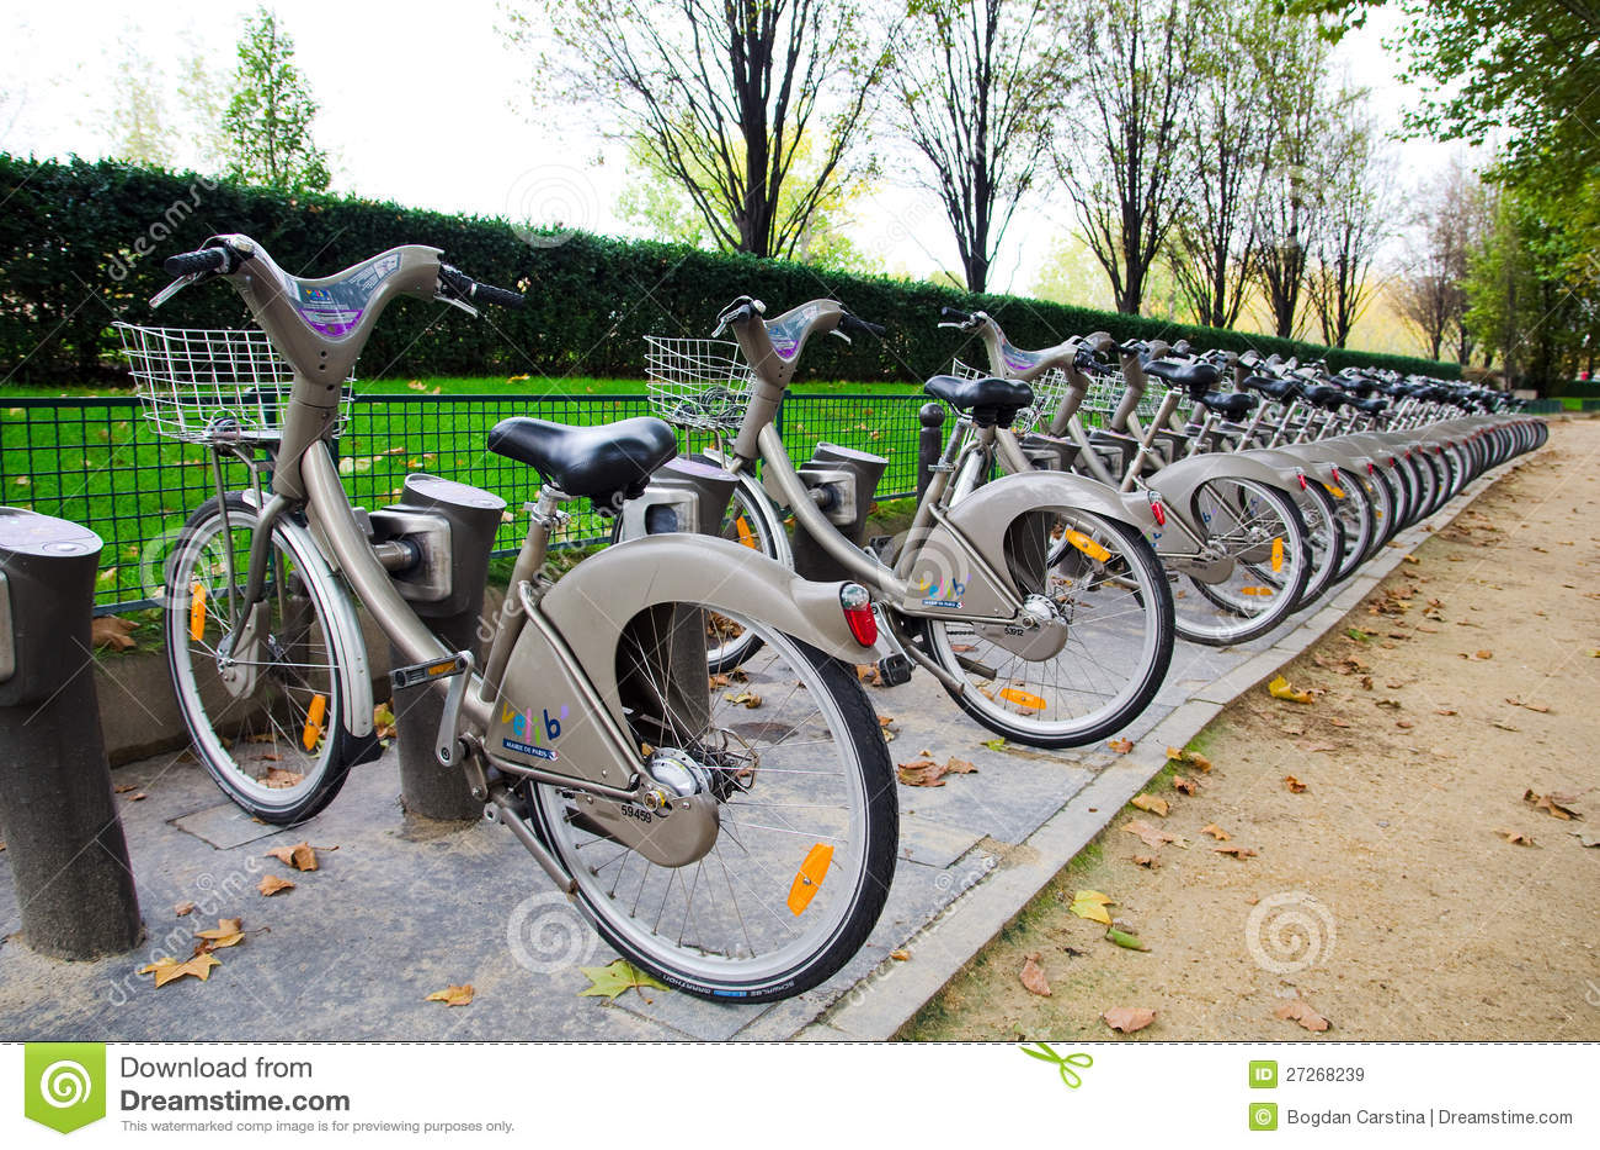 velib bicycle rental system paris editorial stock image image 27268239. Black Bedroom Furniture Sets. Home Design Ideas